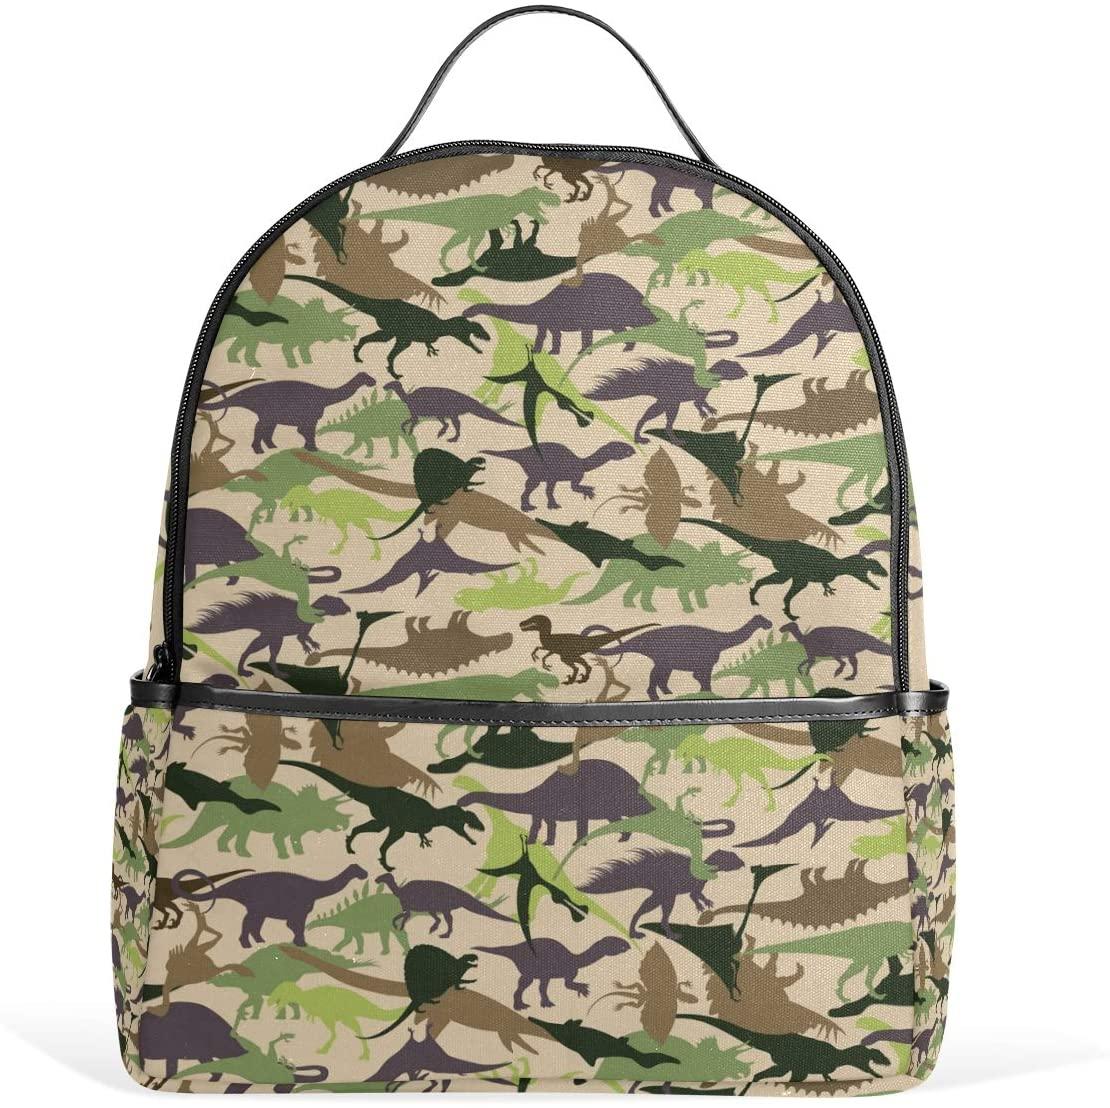 Kids' School Backpack Dinosaurs Set Bookbag for Boys Girls Lightweight Casual Travel Bag Large Capacity Daypack